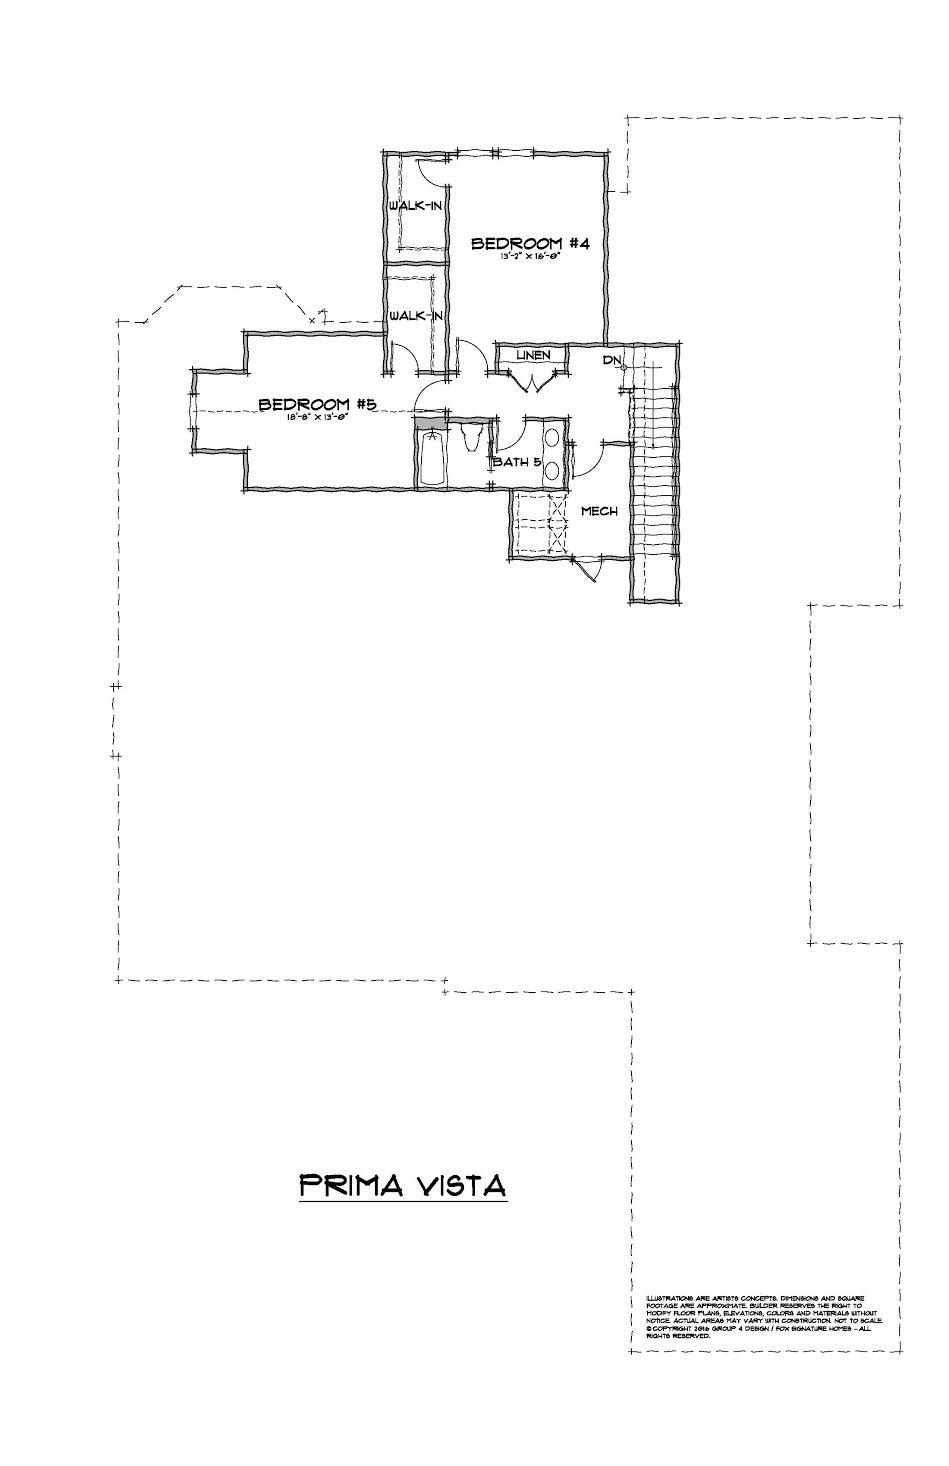 Prima Vista Floorplan 2nd Floor.jpg